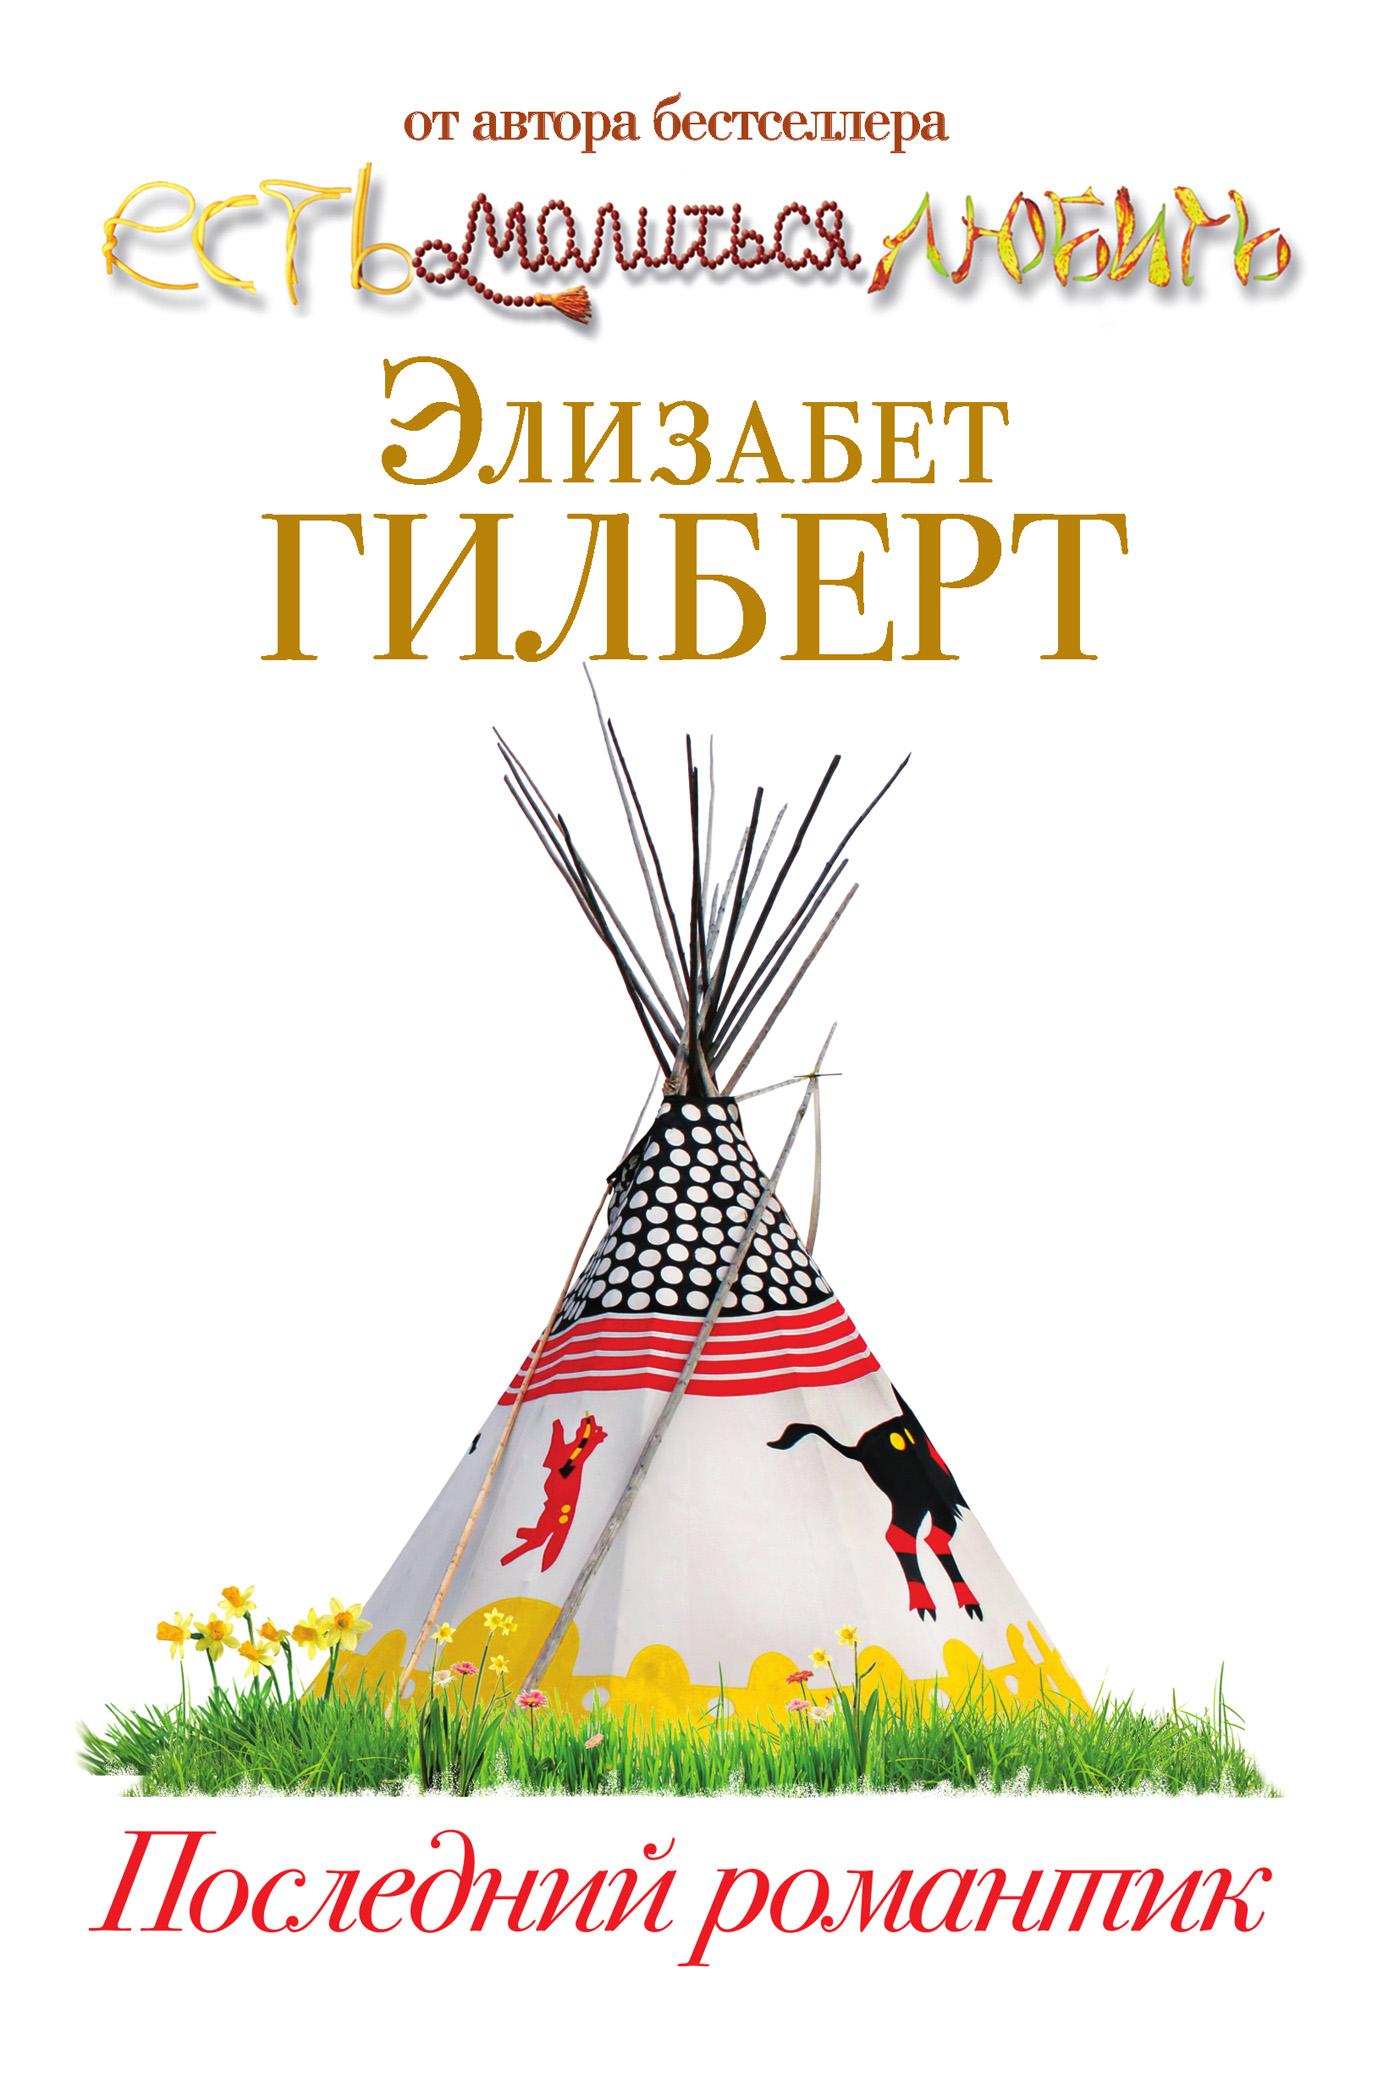 Элизабет Гилберт Последний романтик э гилберт последний романтик isbn 978 5 386 10866 3